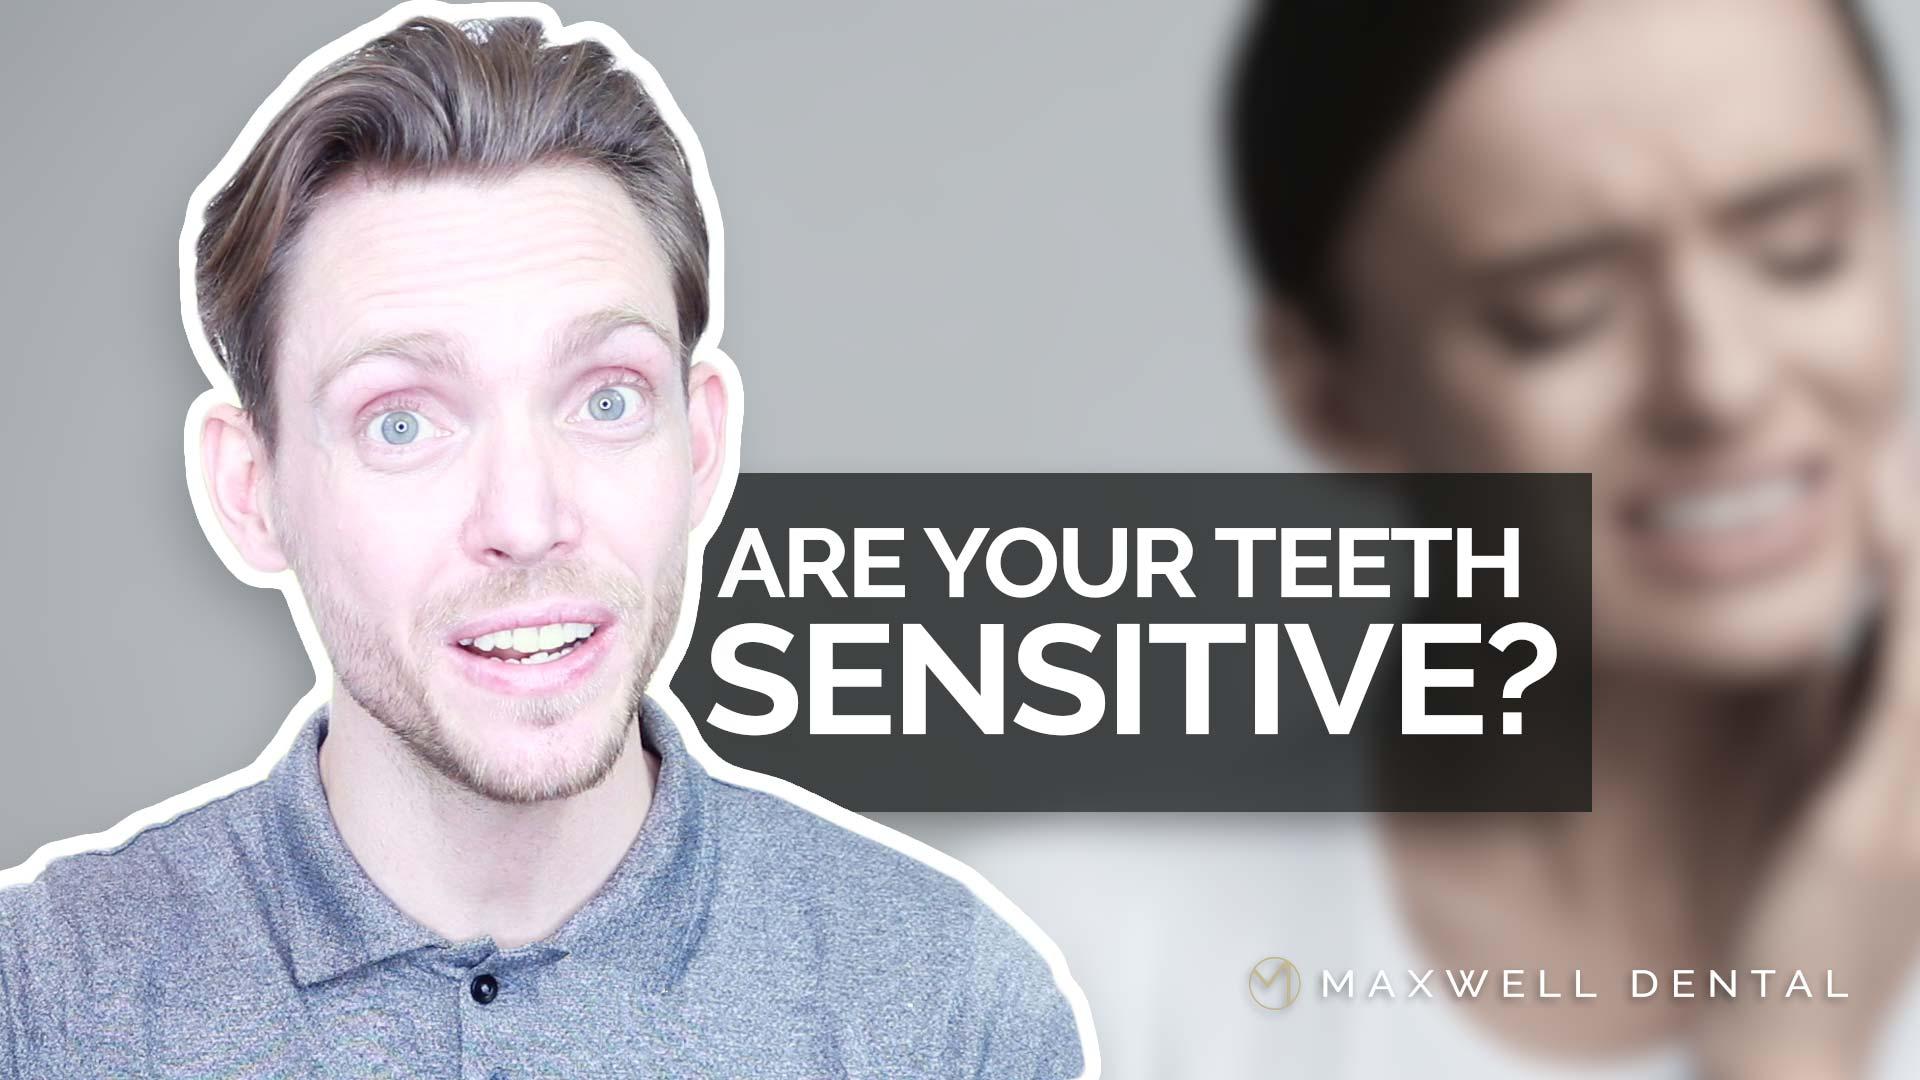 Holistic Dentist Calgary Sensitive Teeth